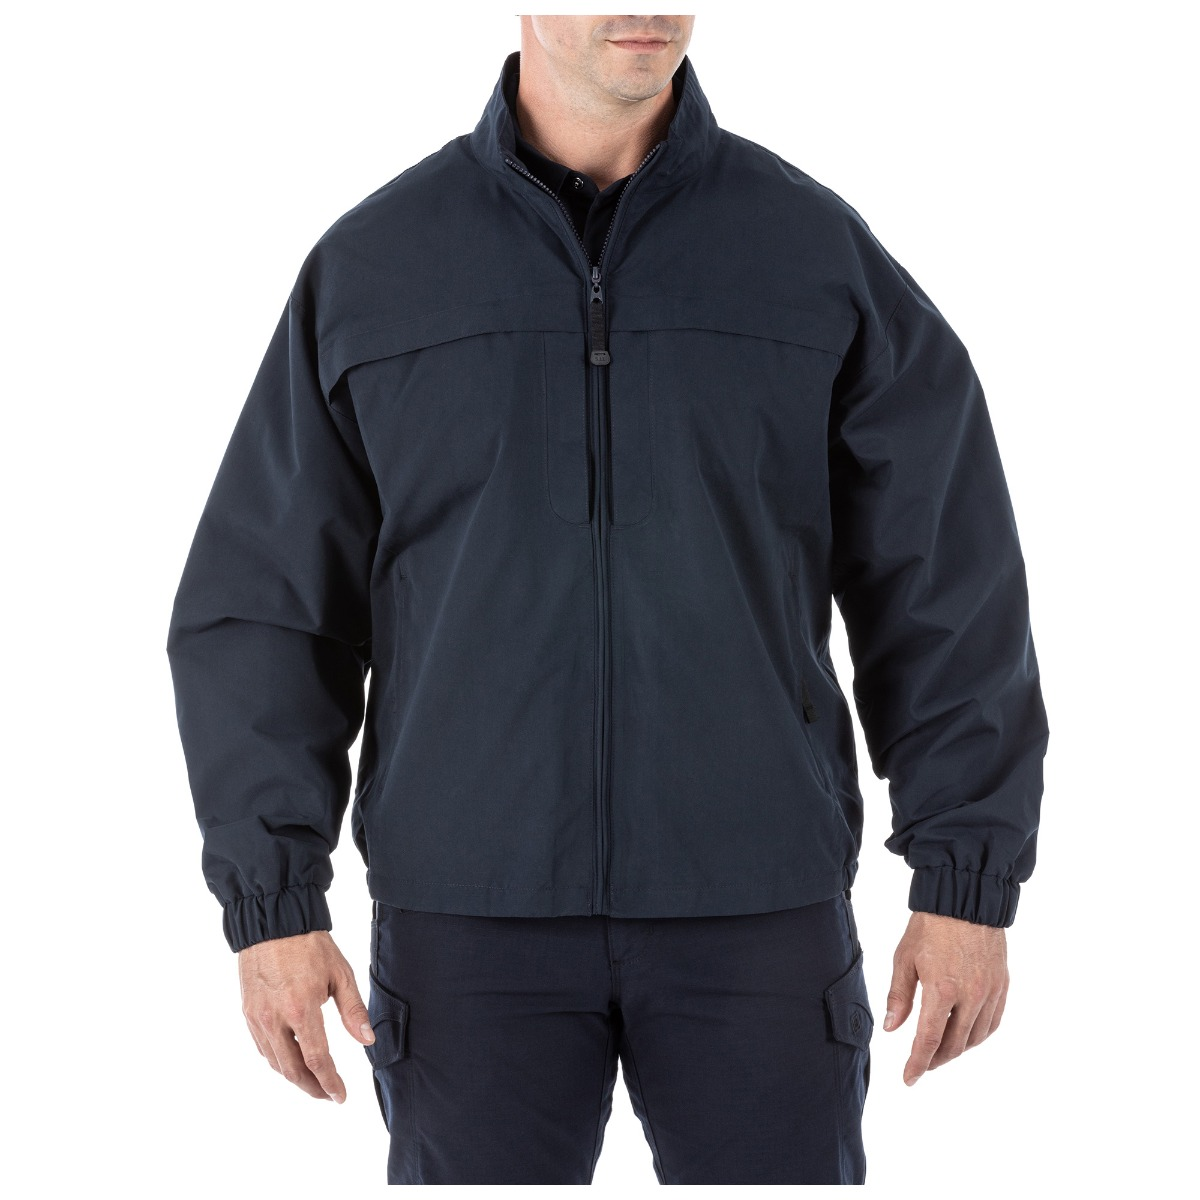 5.11 Tactical Men's Response Jacket (Blue)